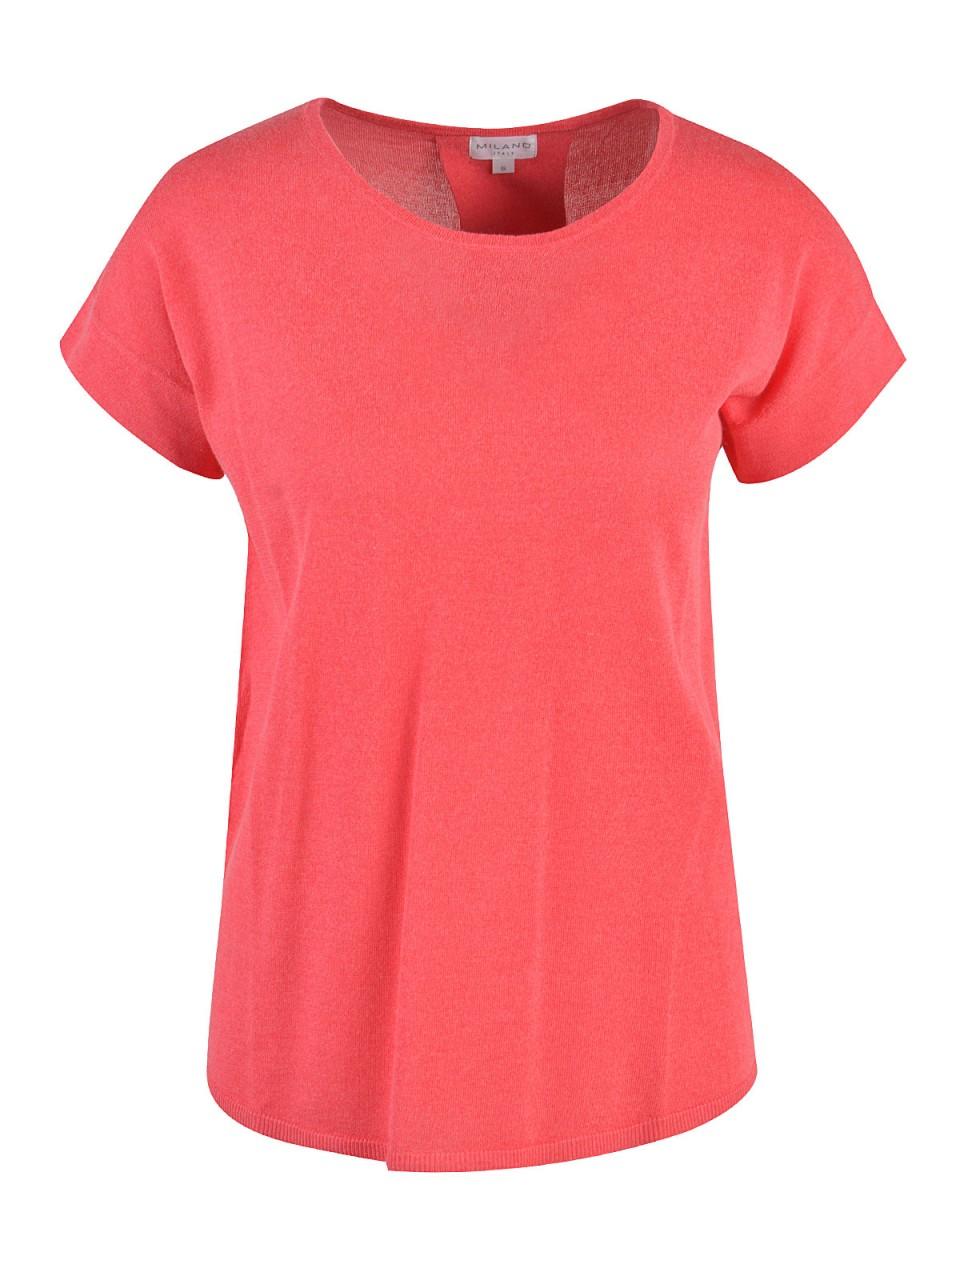 milano-italy-damen-t-shirt-rot